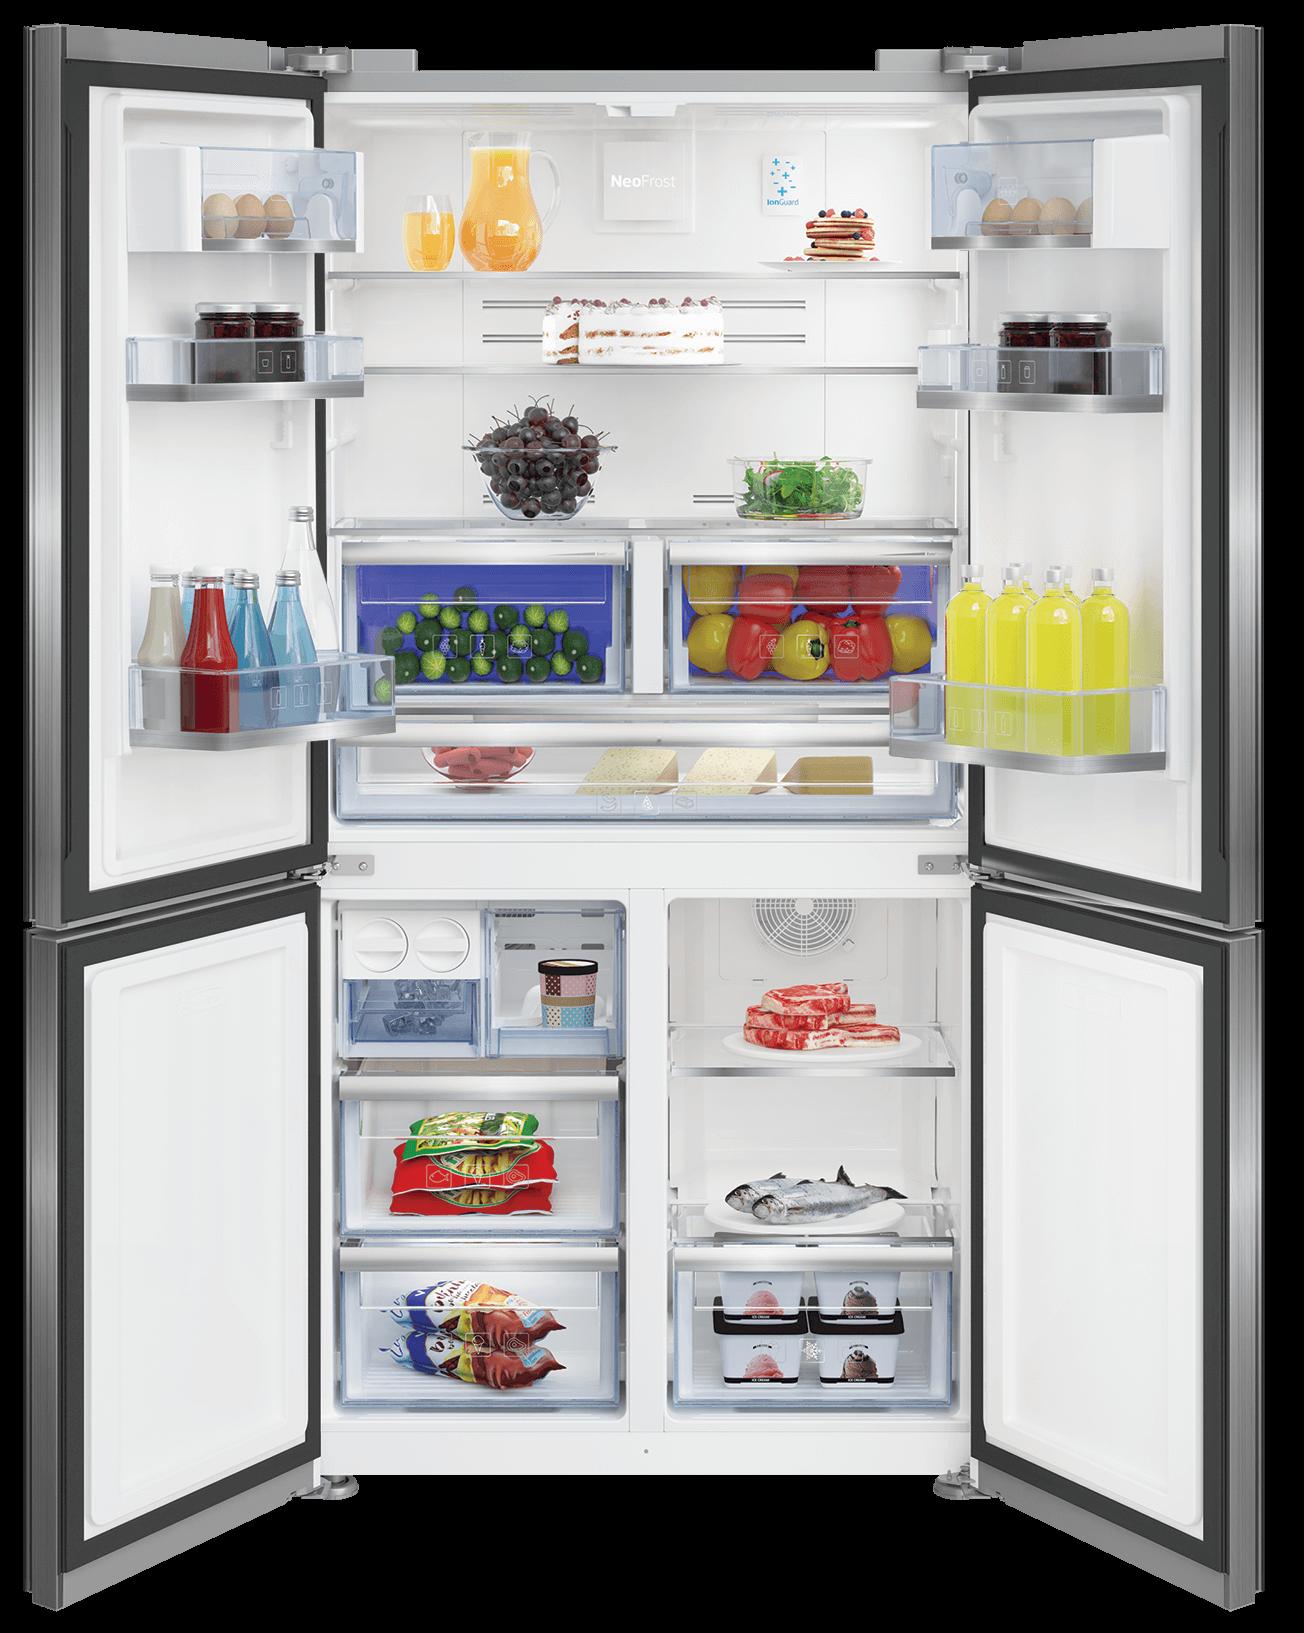 refrigerateur congelateur tres grande capacite XL